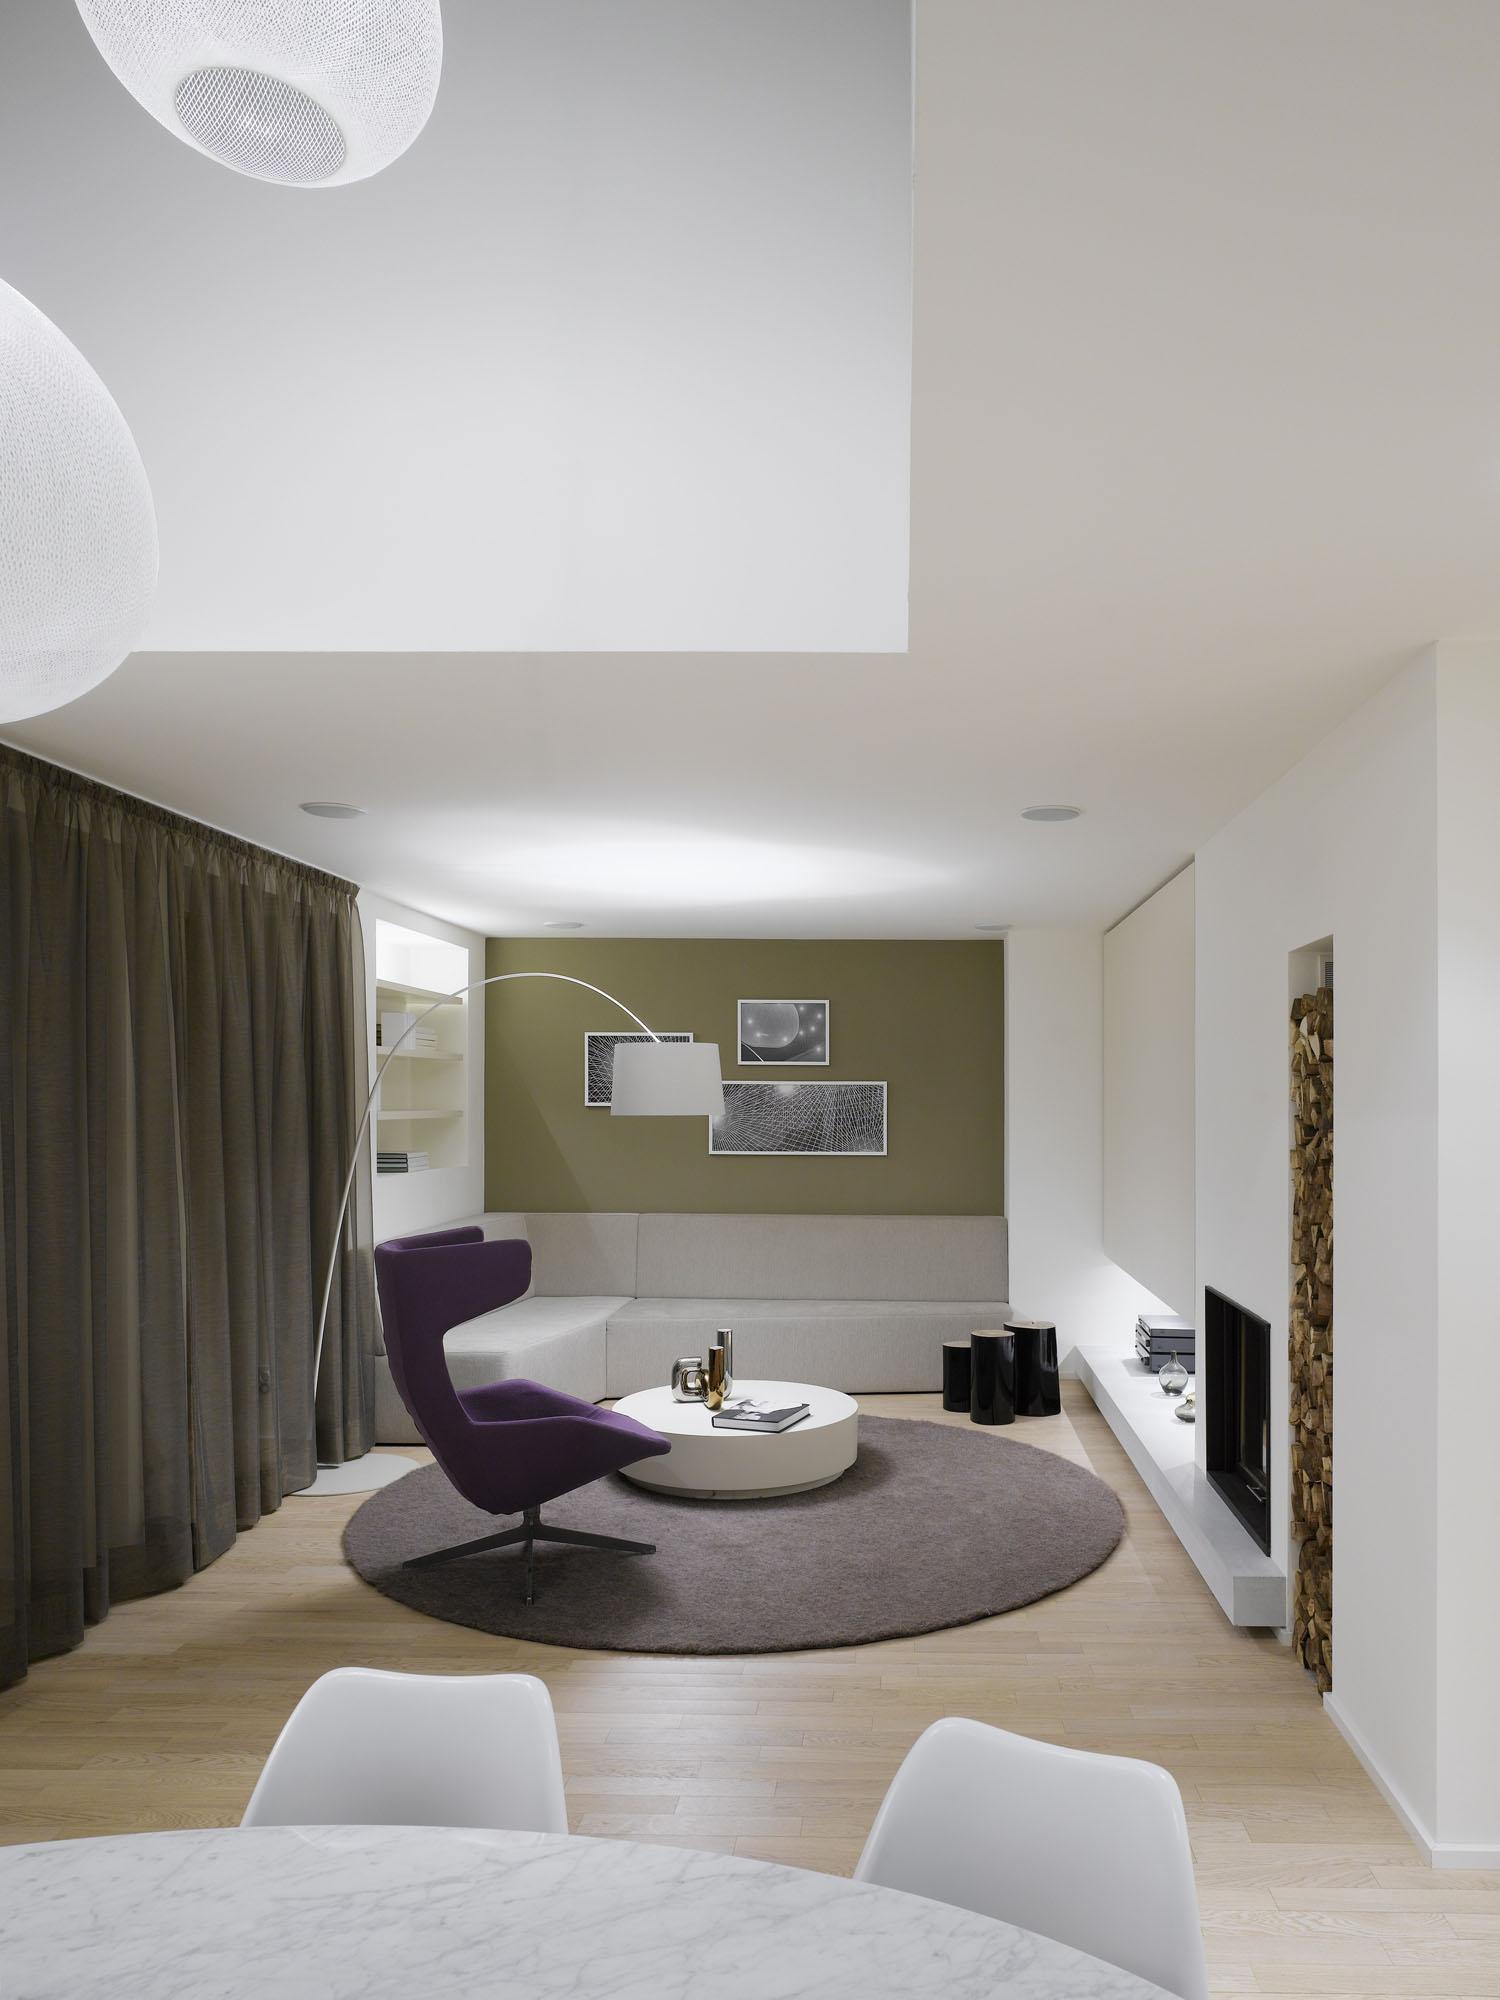 quant 1 apartment by ippolito fleitz group homedezen. Black Bedroom Furniture Sets. Home Design Ideas